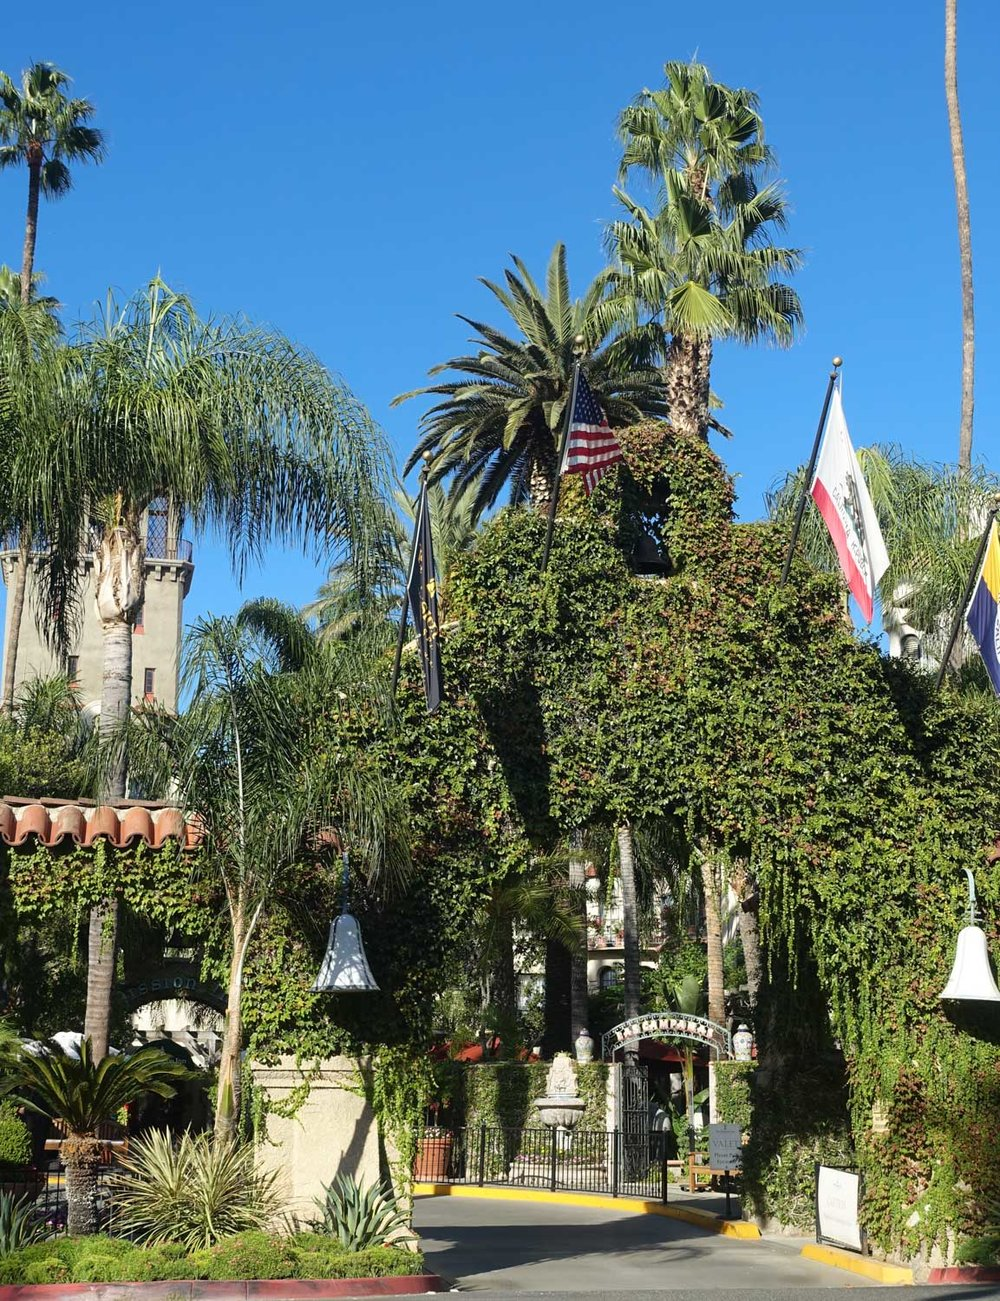 Mission Inn, Riverside